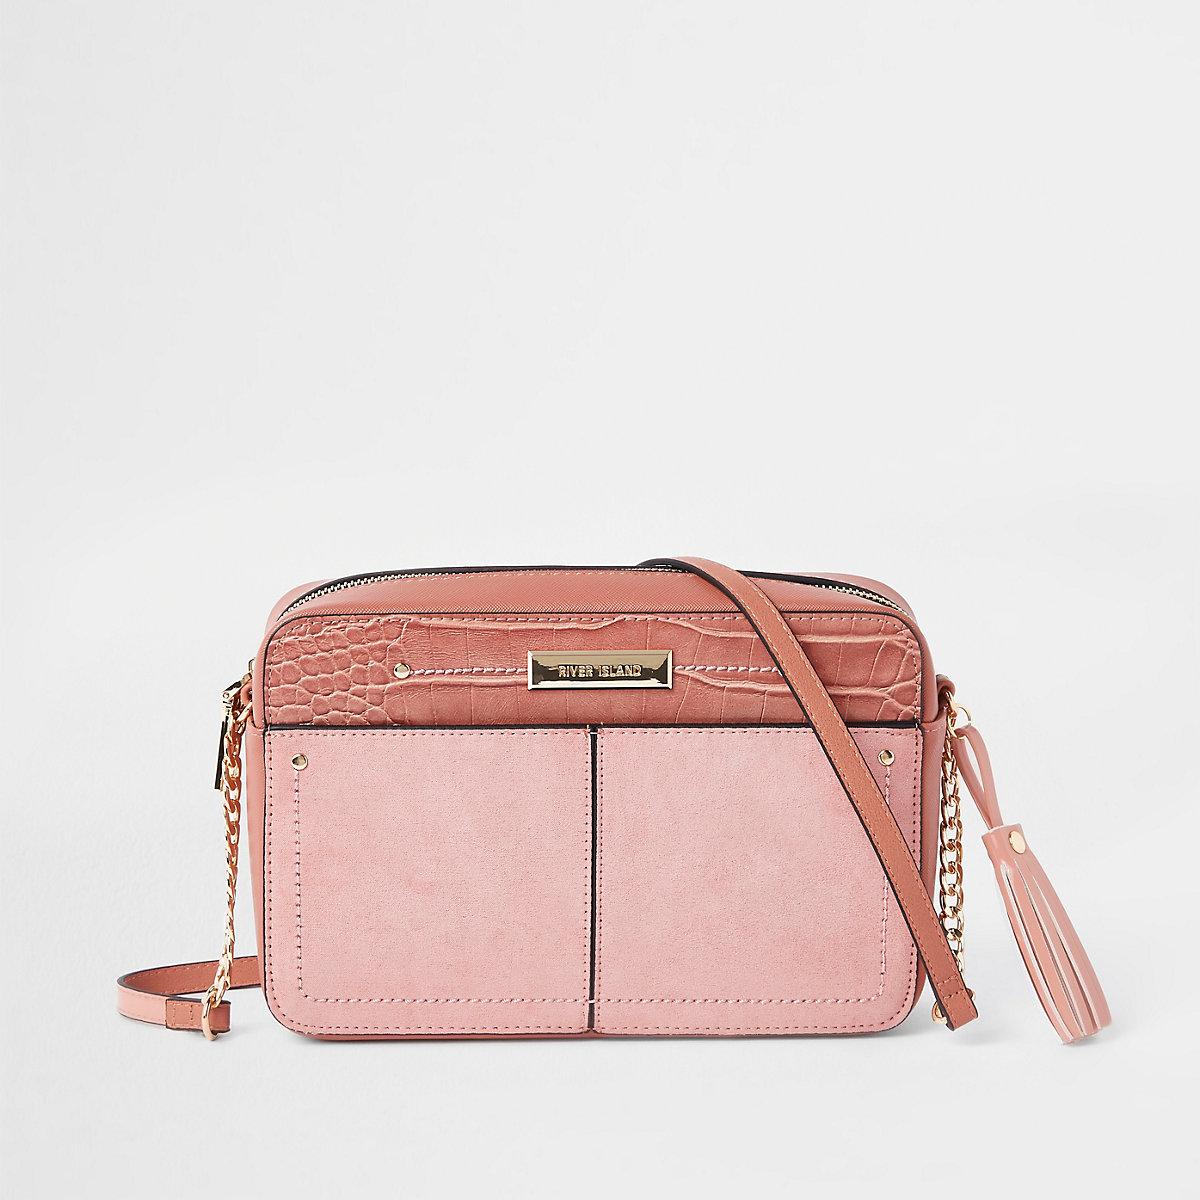 Light pink tassel boxy cross body bag